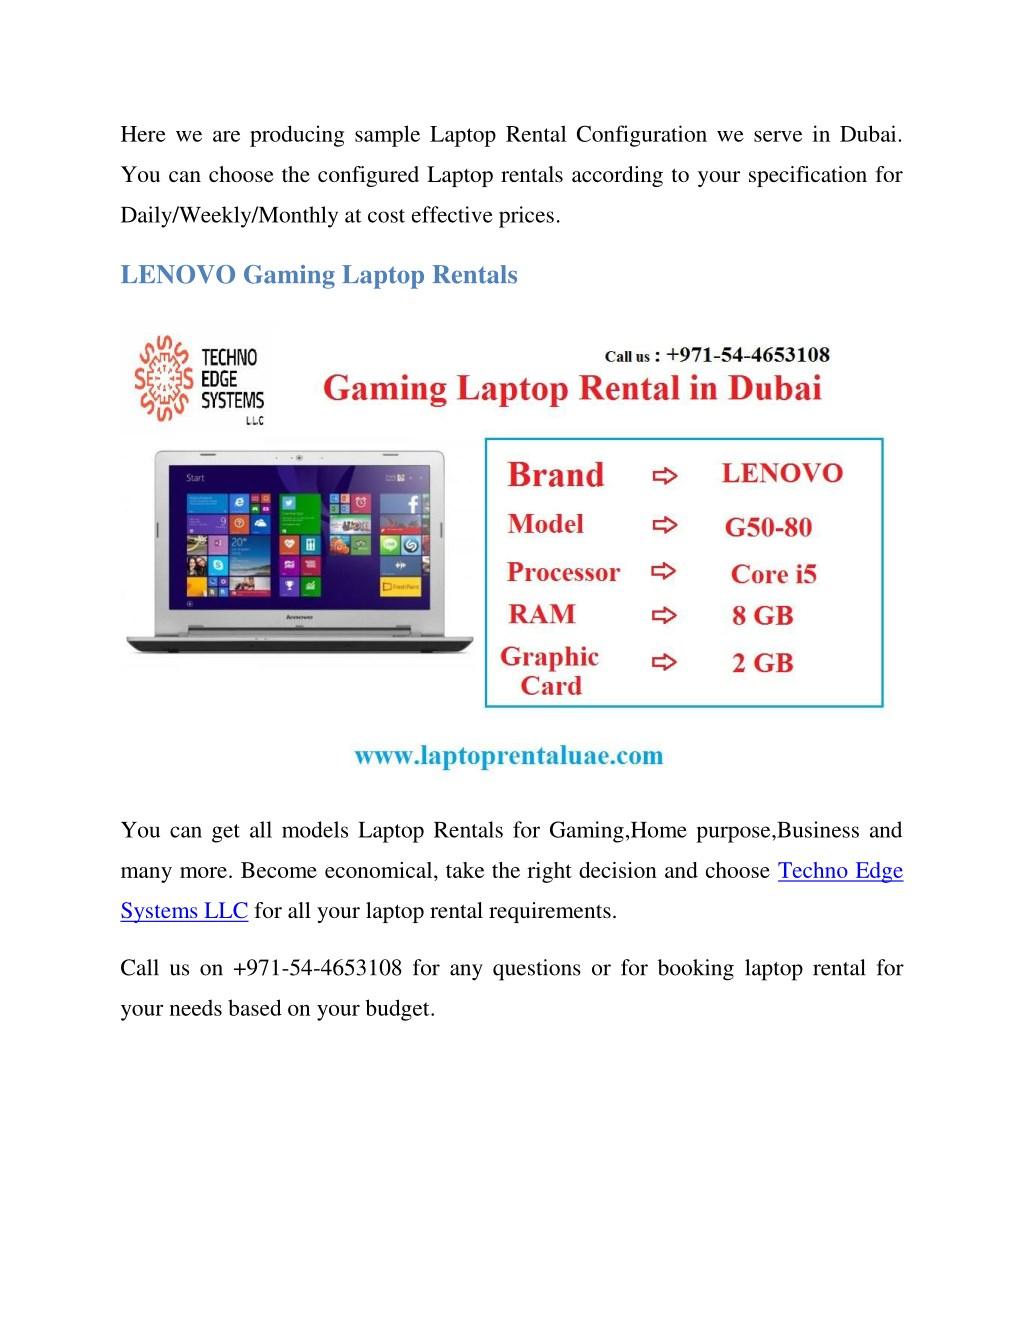 PPT - LENOVO Laptop Rentals in Dubai PowerPoint Presentation